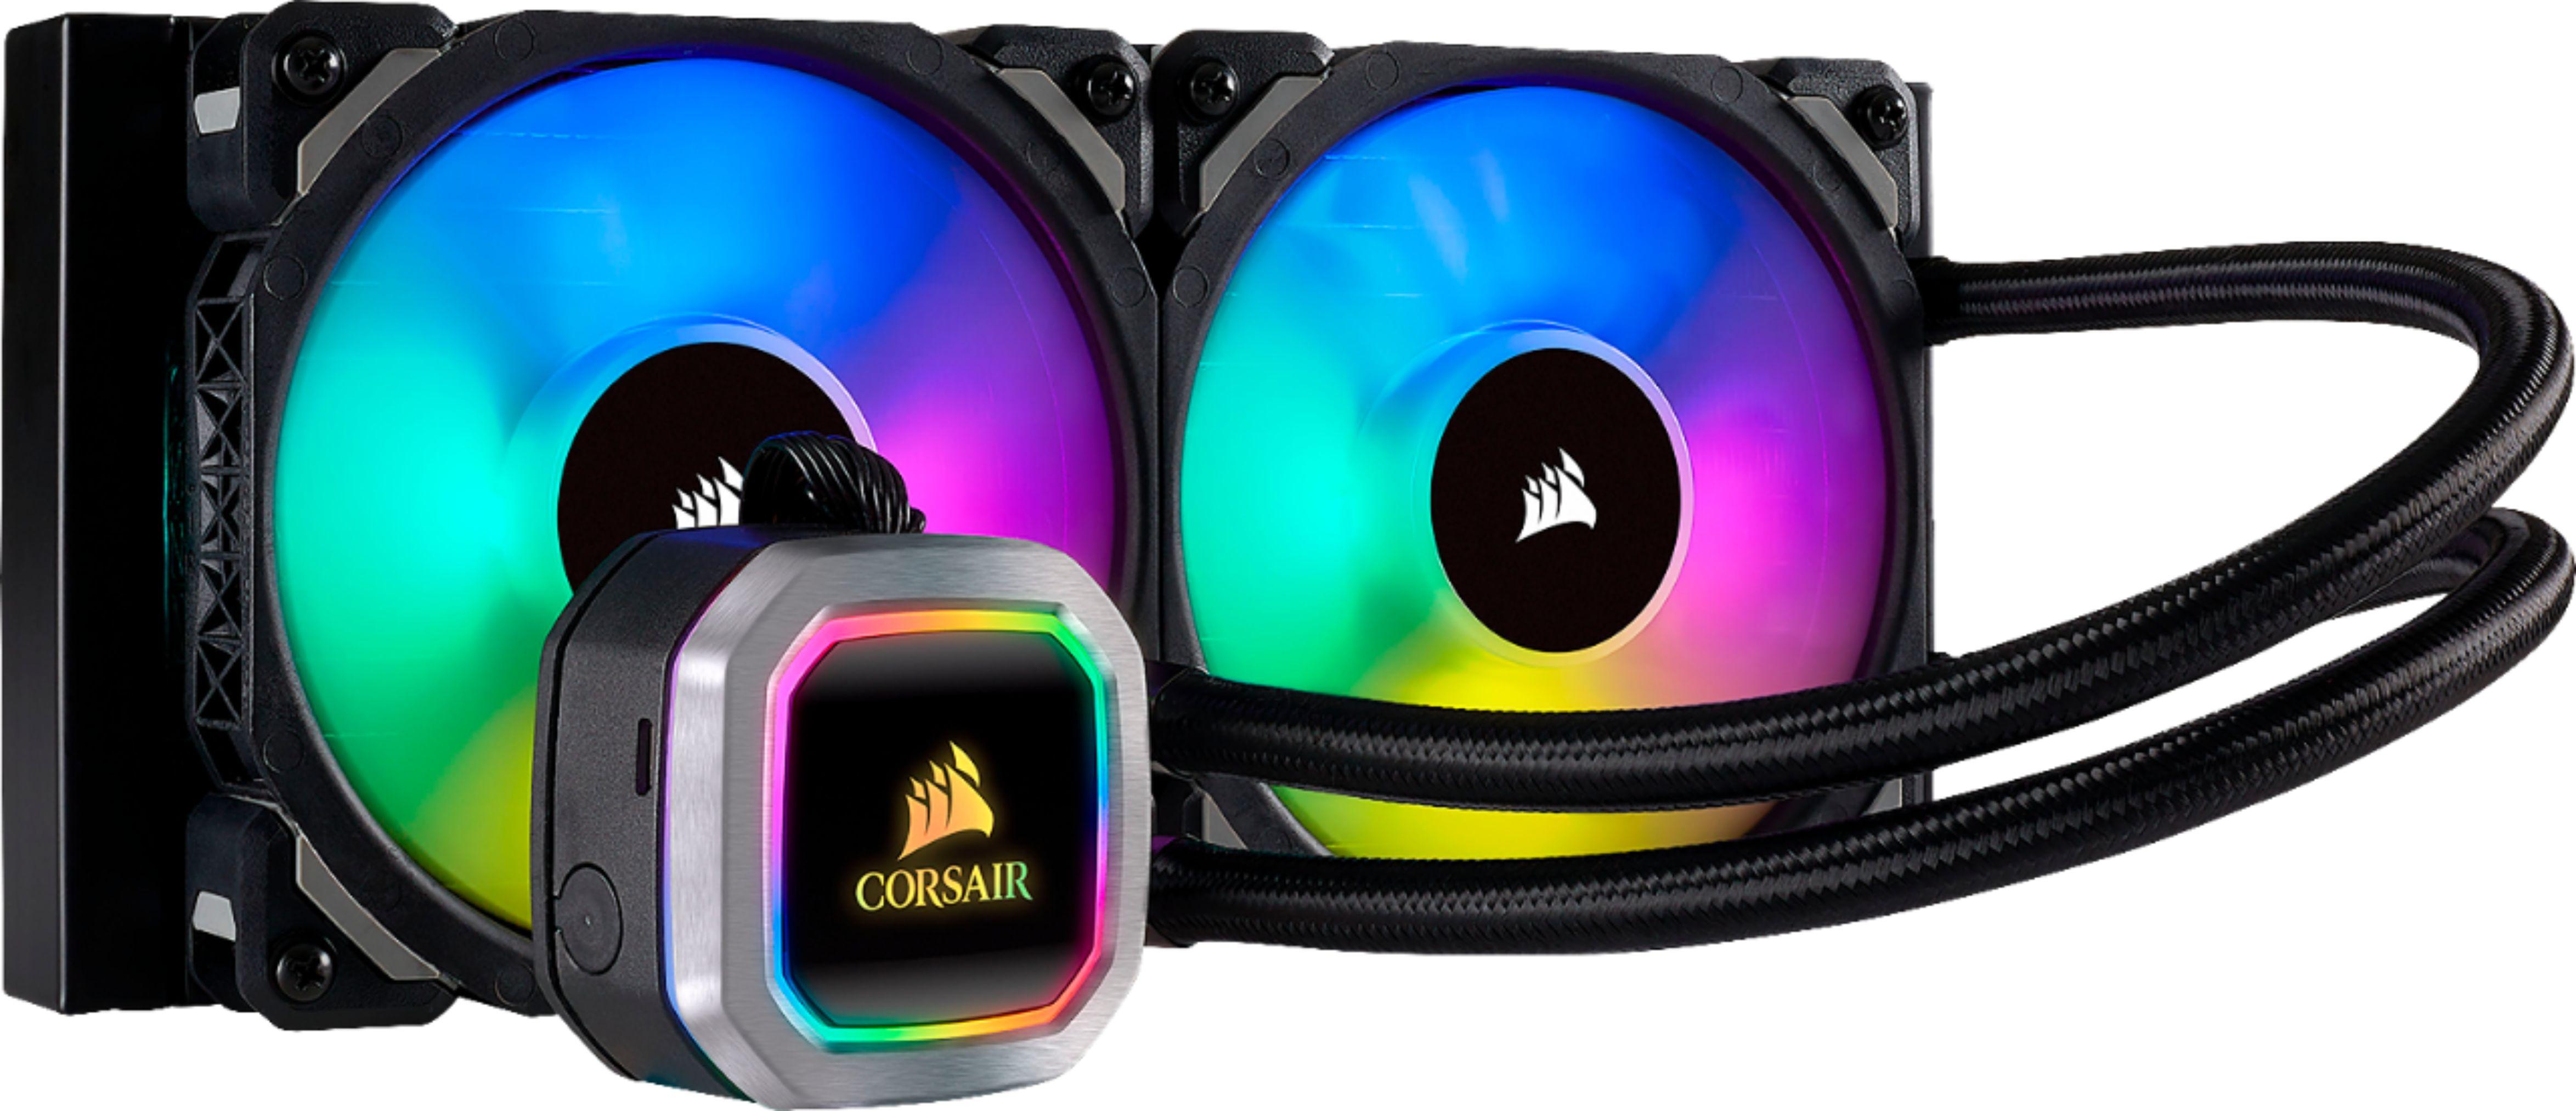 CORSAIR - Hydro Series H100i RGB Platinum 120mm Processor Liquid Cooling System with RGB Lighting - Black/Silver $139.99 + Free Shipping @ Best Buy